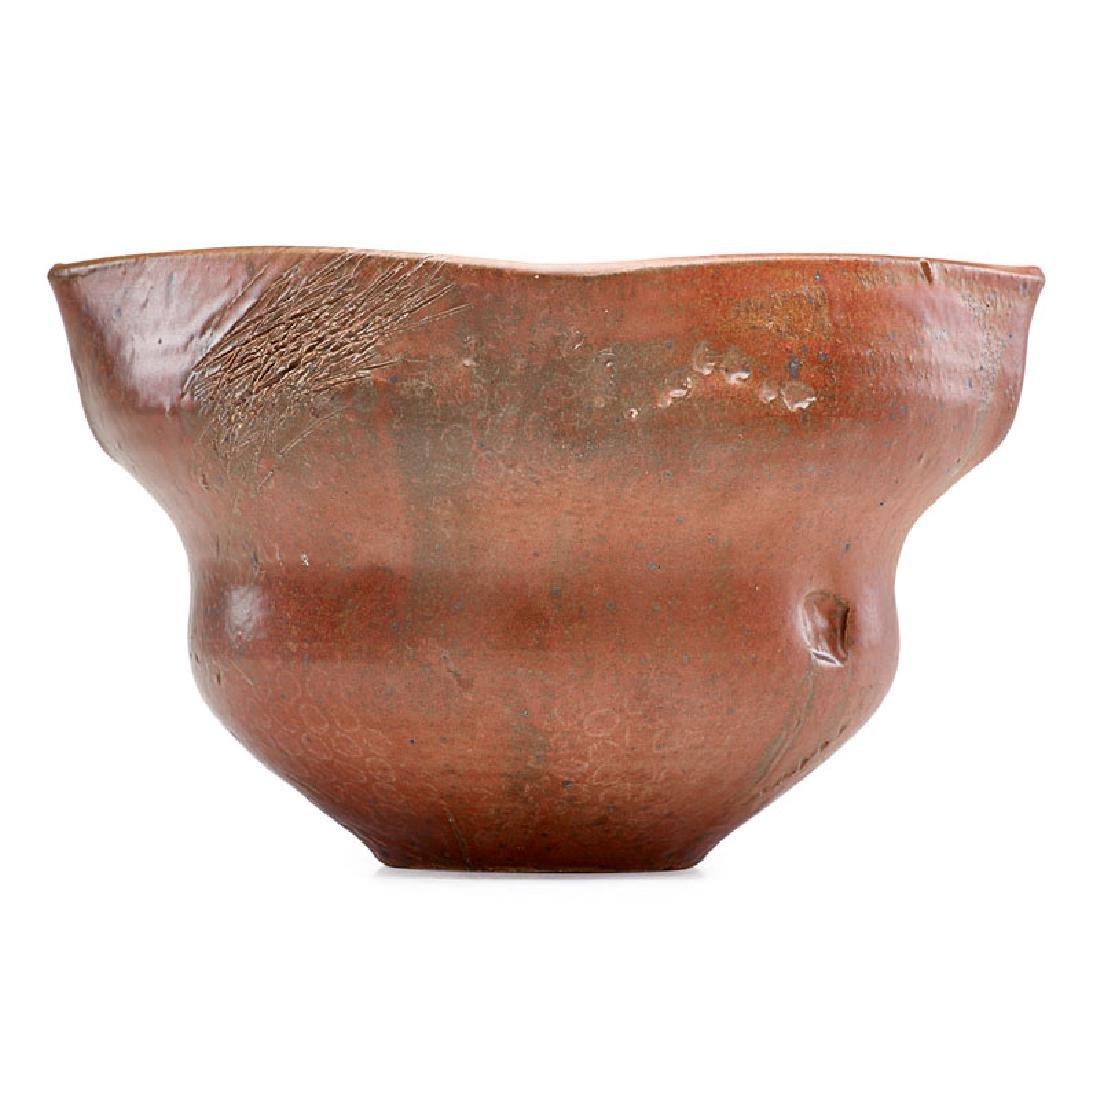 ROBERT TURNER Stoneware vessel - 2